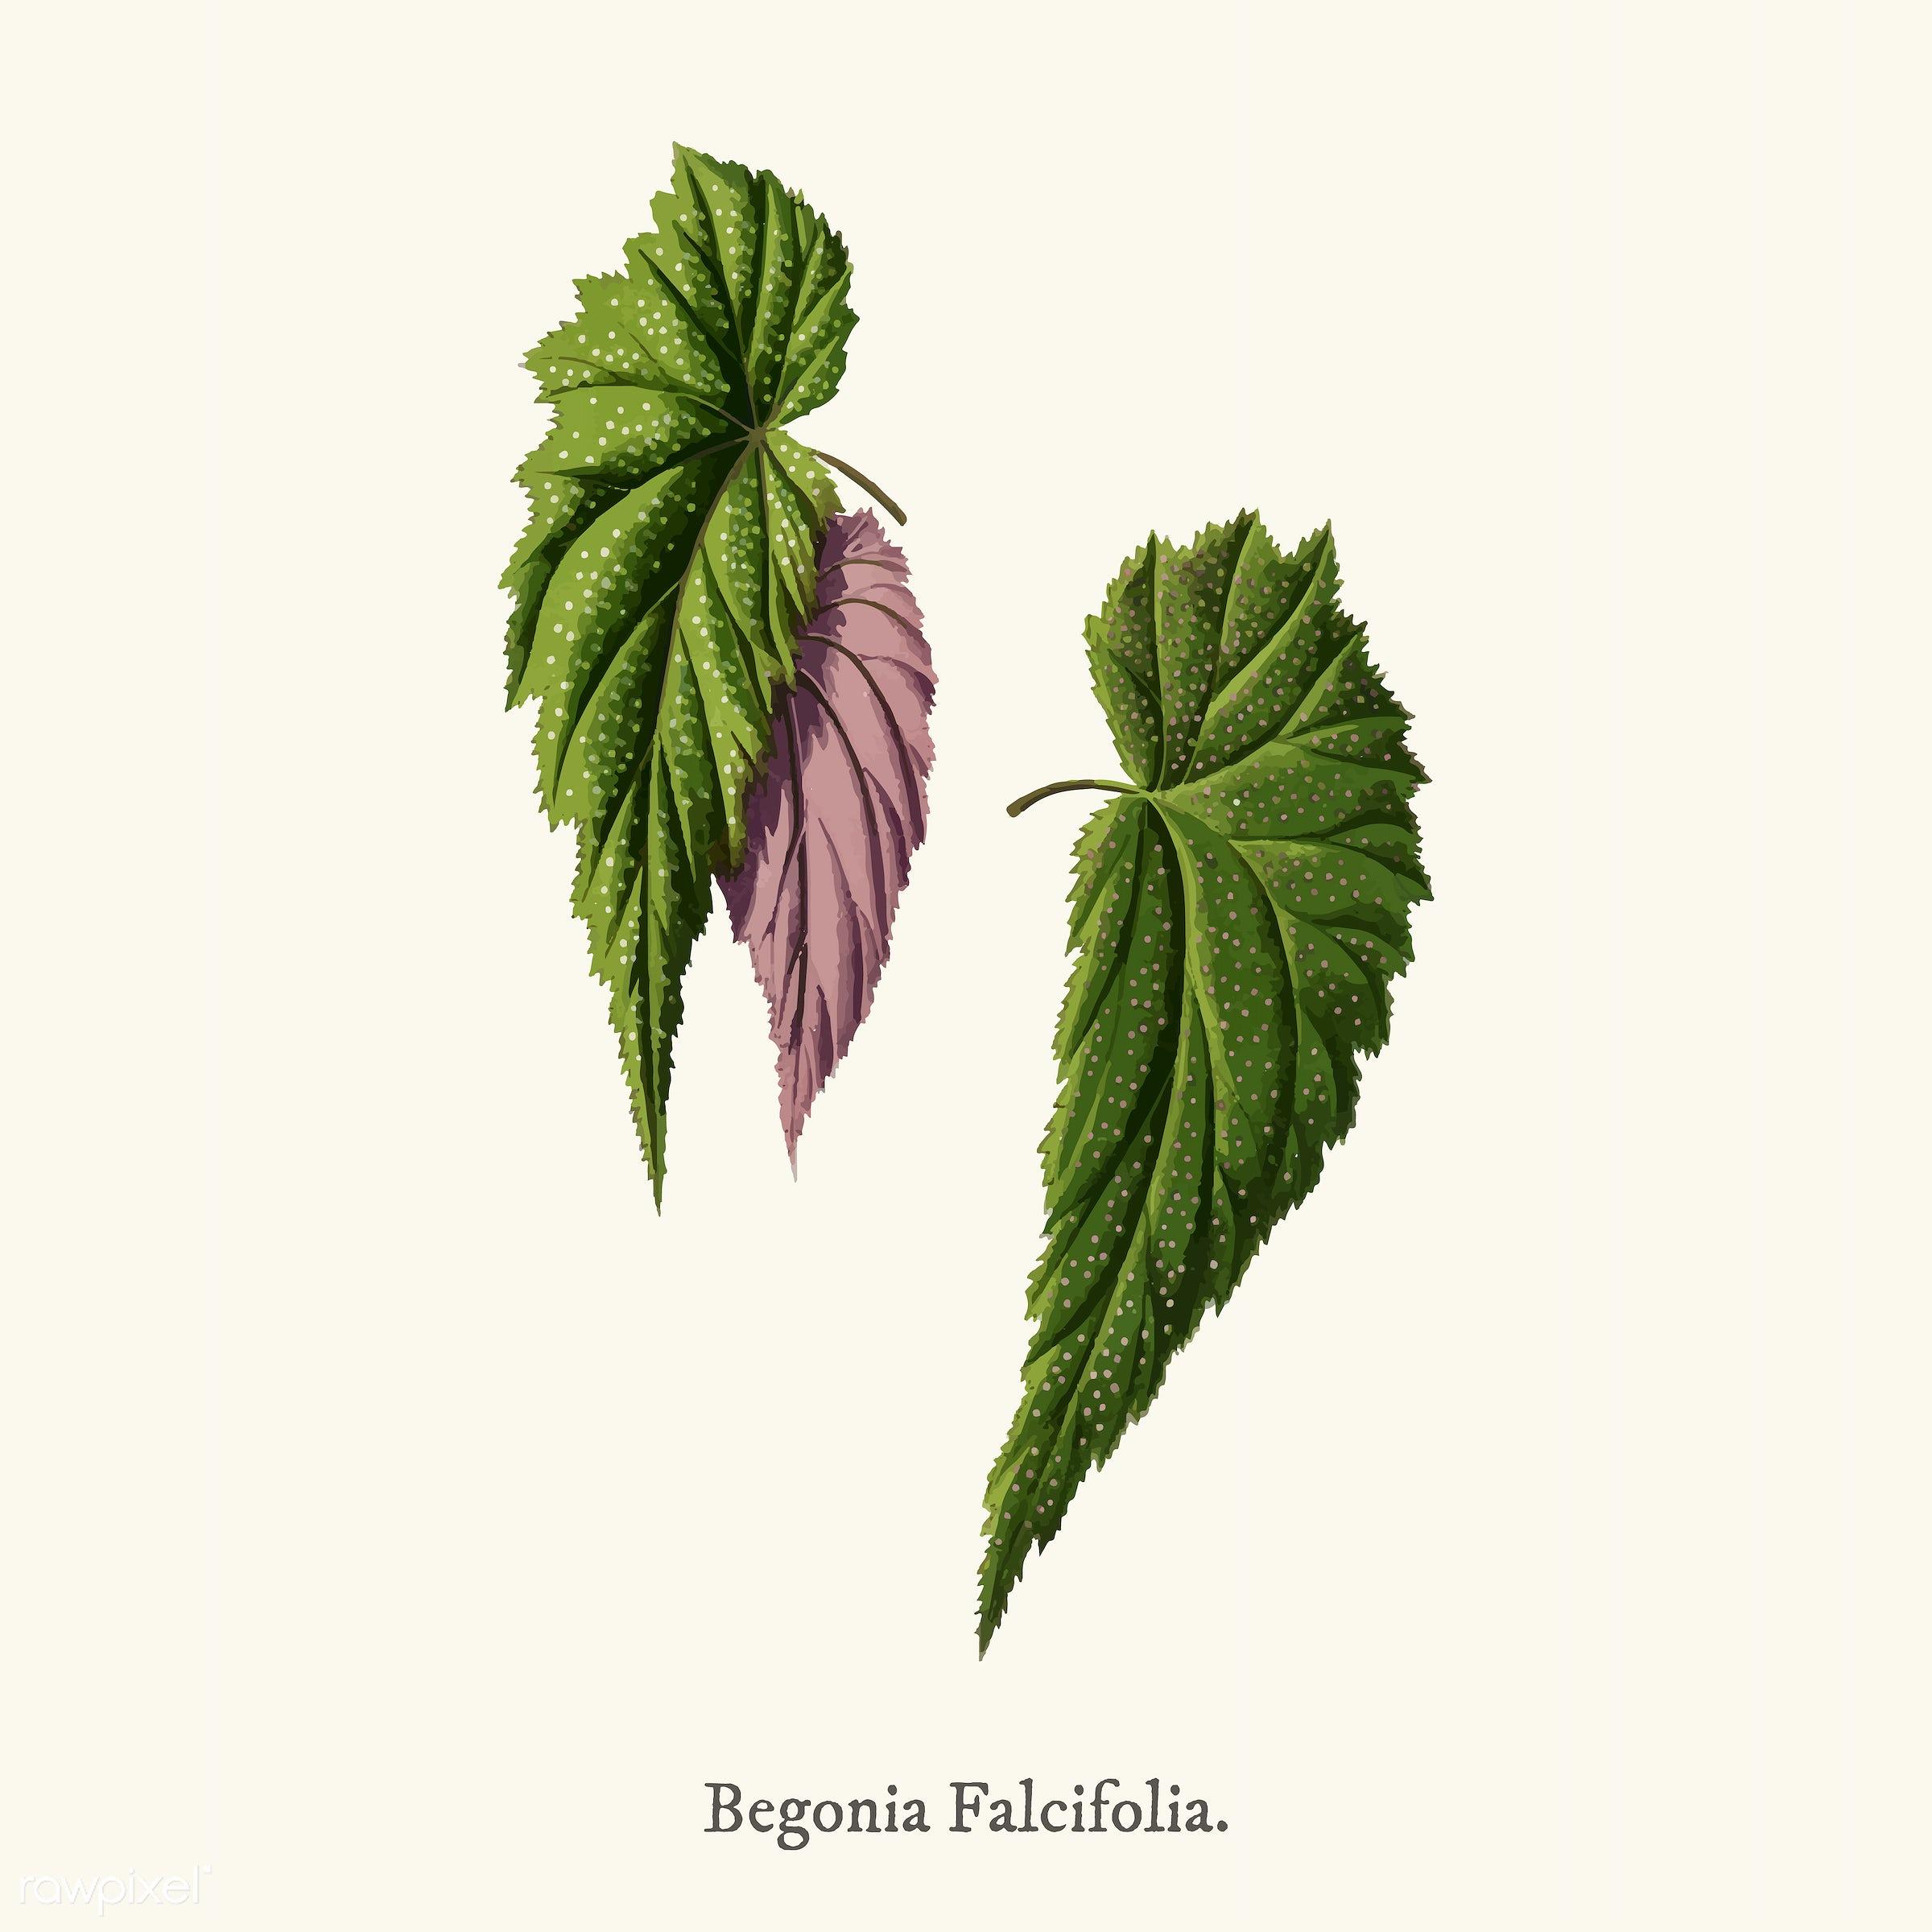 decoration, leaf, plant, ancient, antique, begonia, begonia falcifolia, decorate, design, drawing, falcifolia, graphic,...